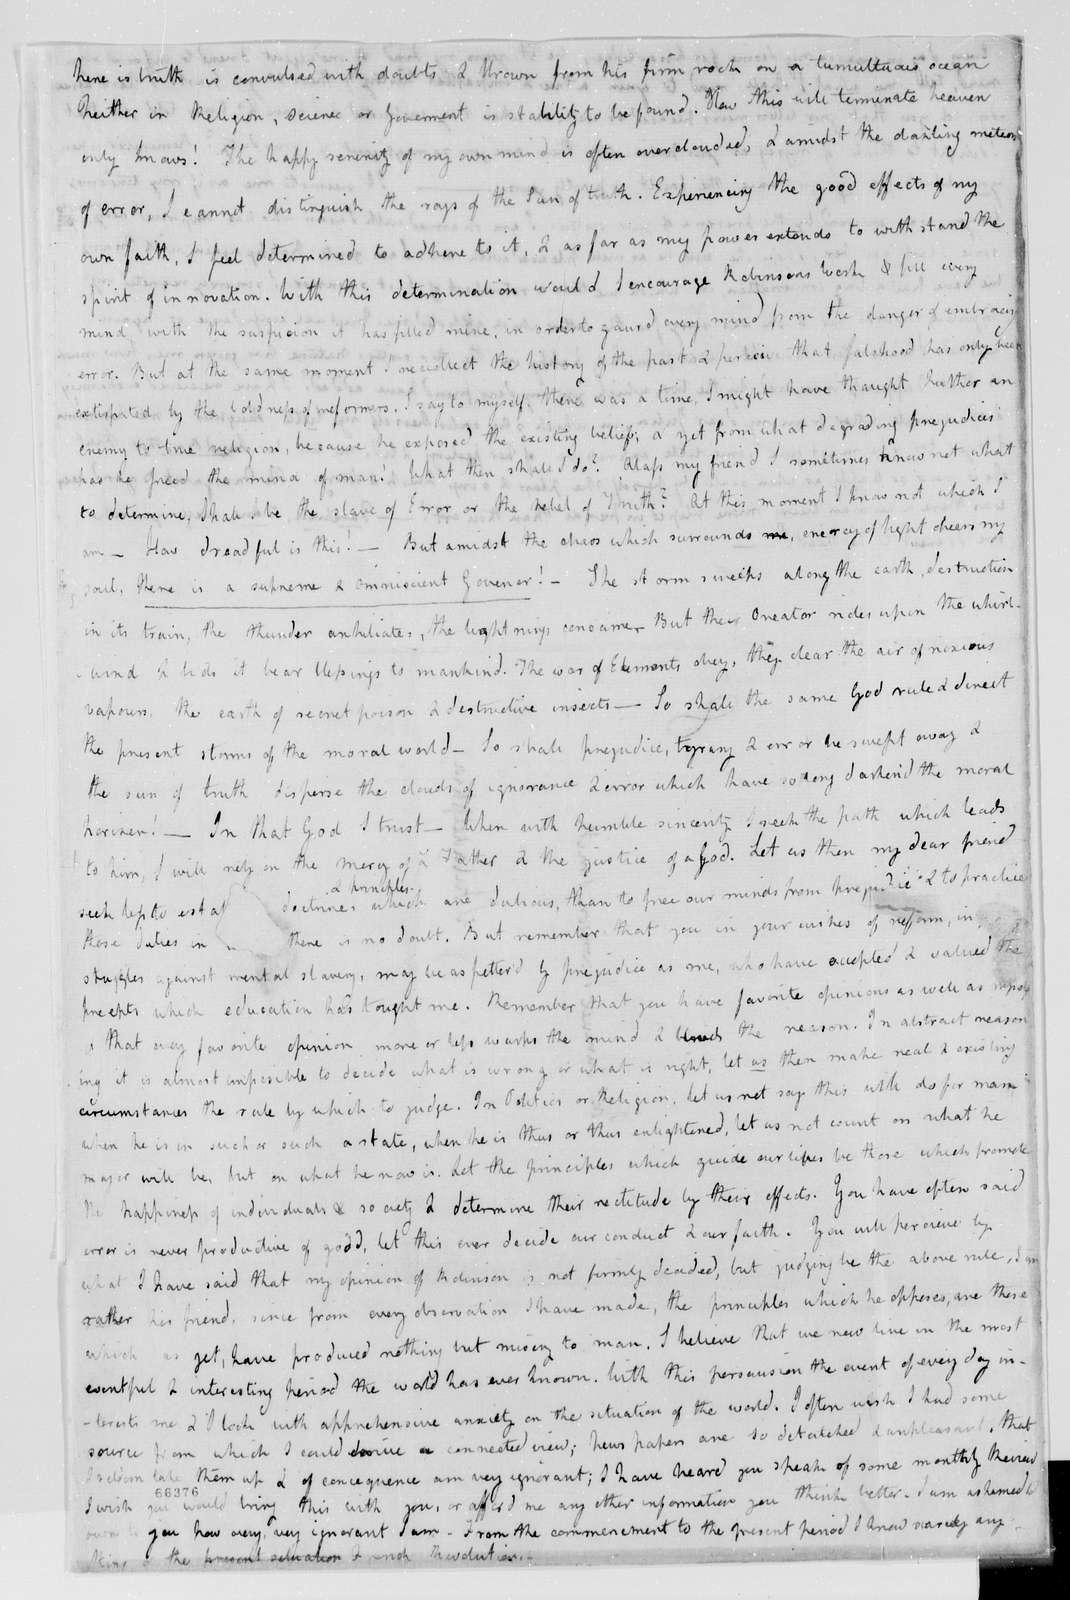 Margaret Bayard Smith Papers: Family Correspondence, 1789-1842; Smith, Samuel Harrison (husband); 1798, July-Nov